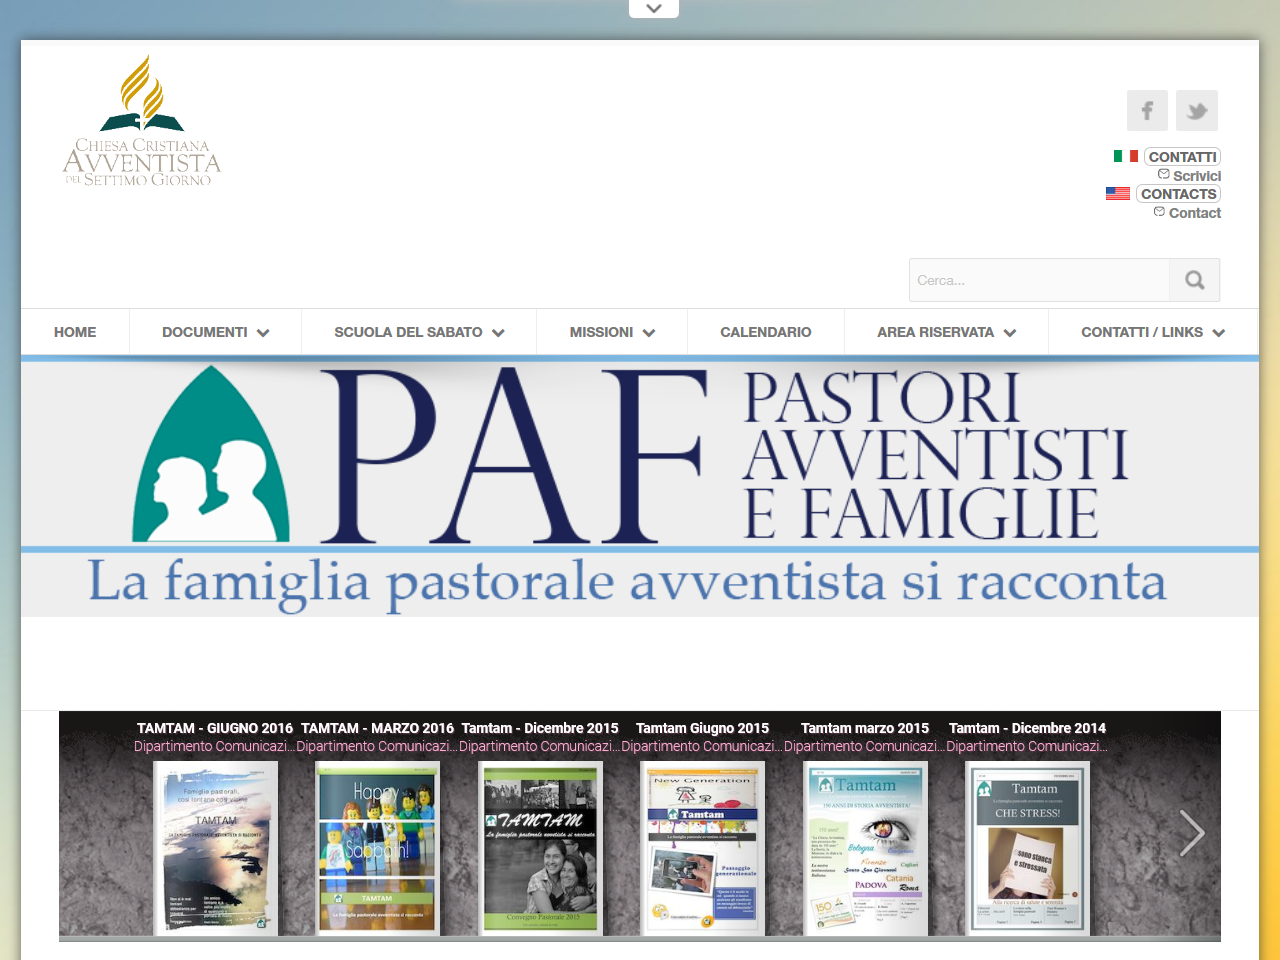 PAF Pastori Avventisti E Famiglie